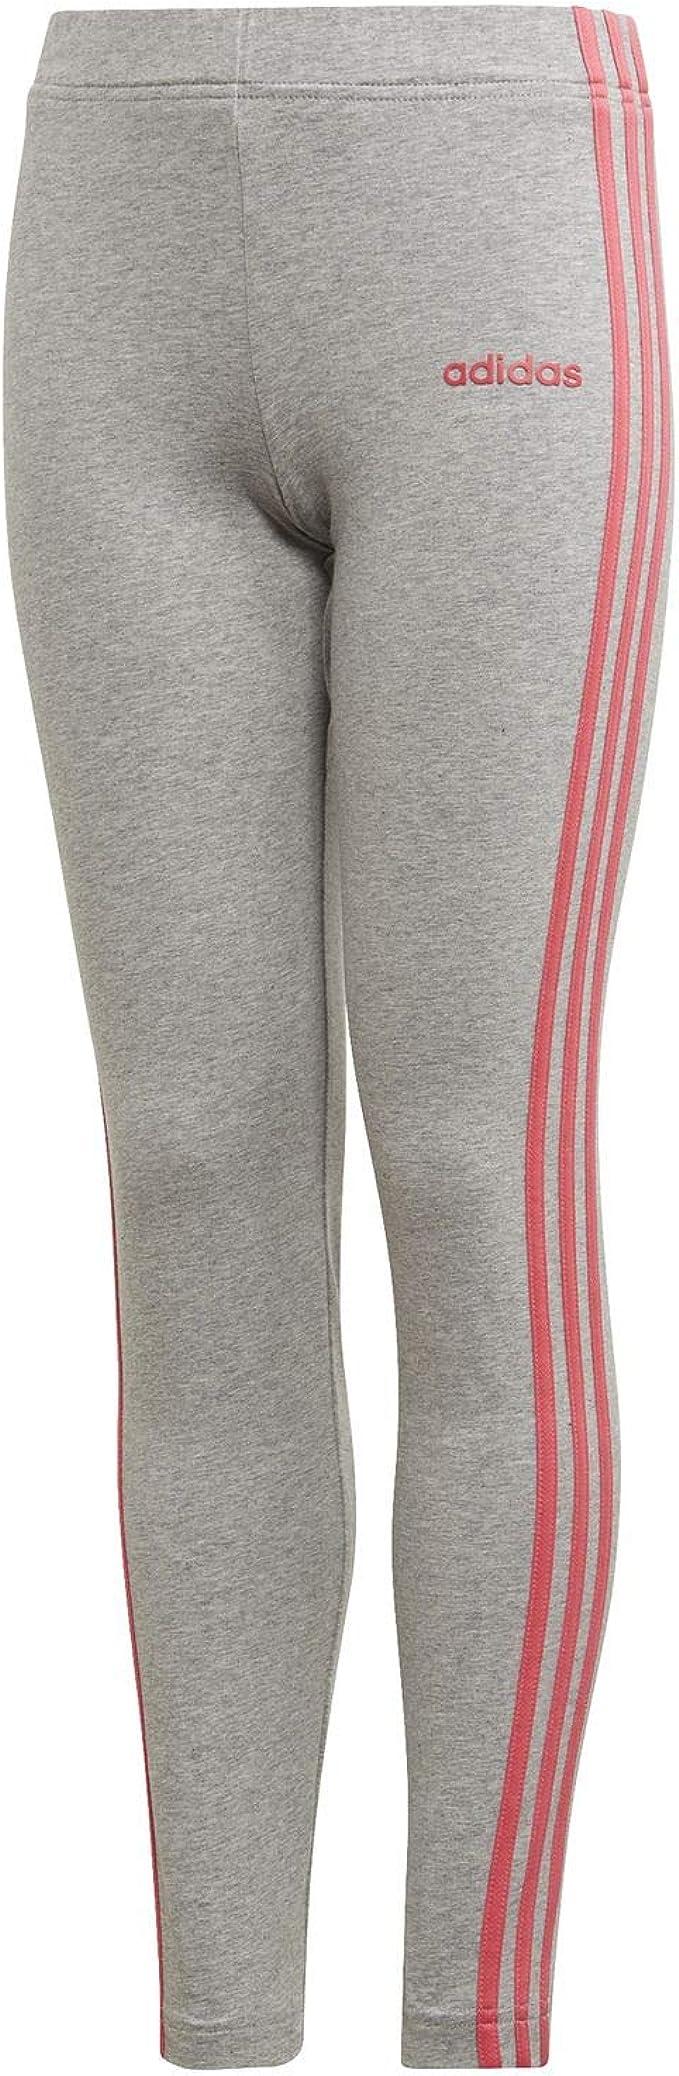 adidas leggings 4-5